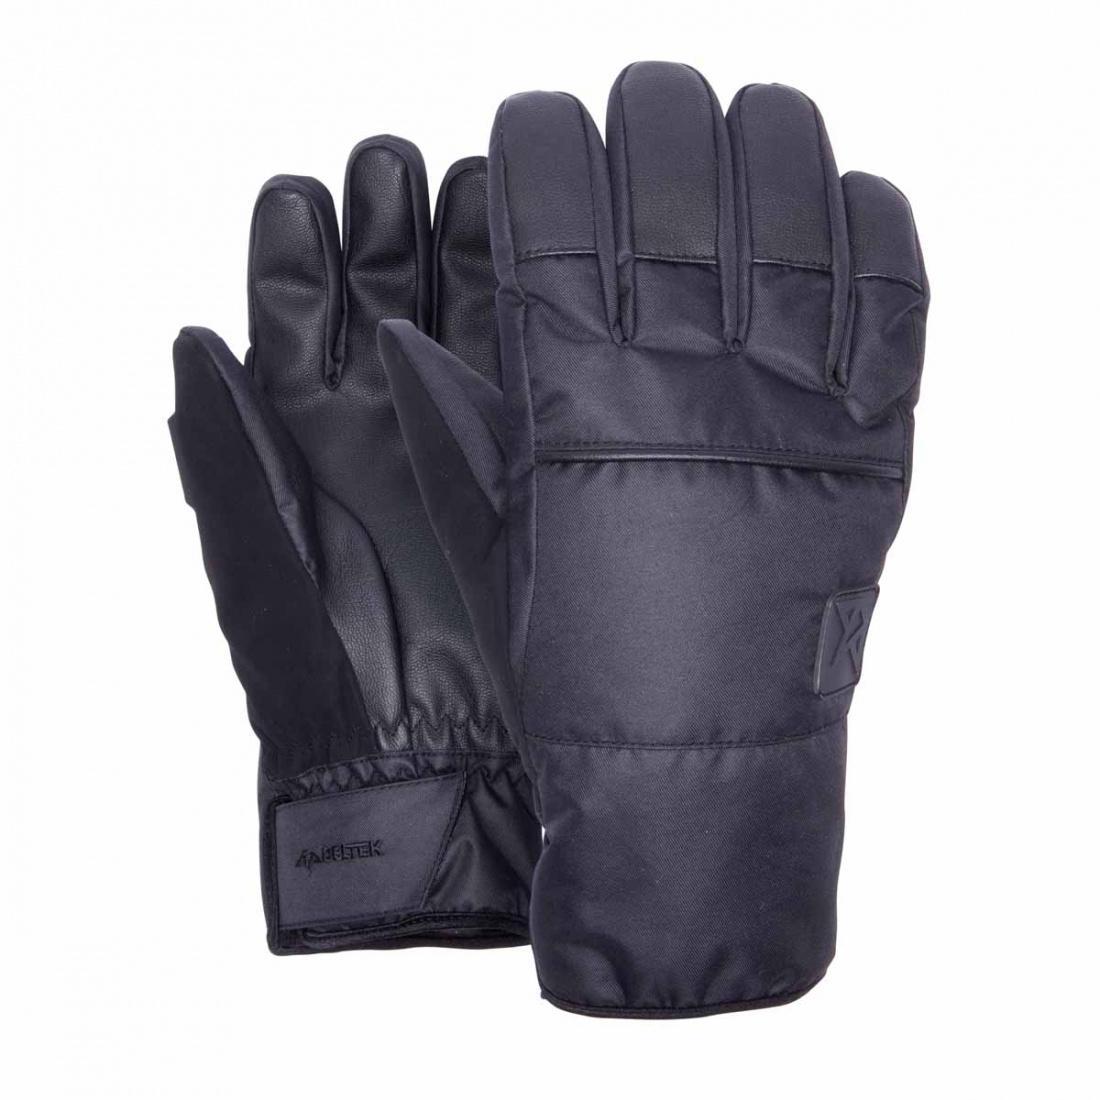 Перчатки Celtek ACE GLOVE Black M